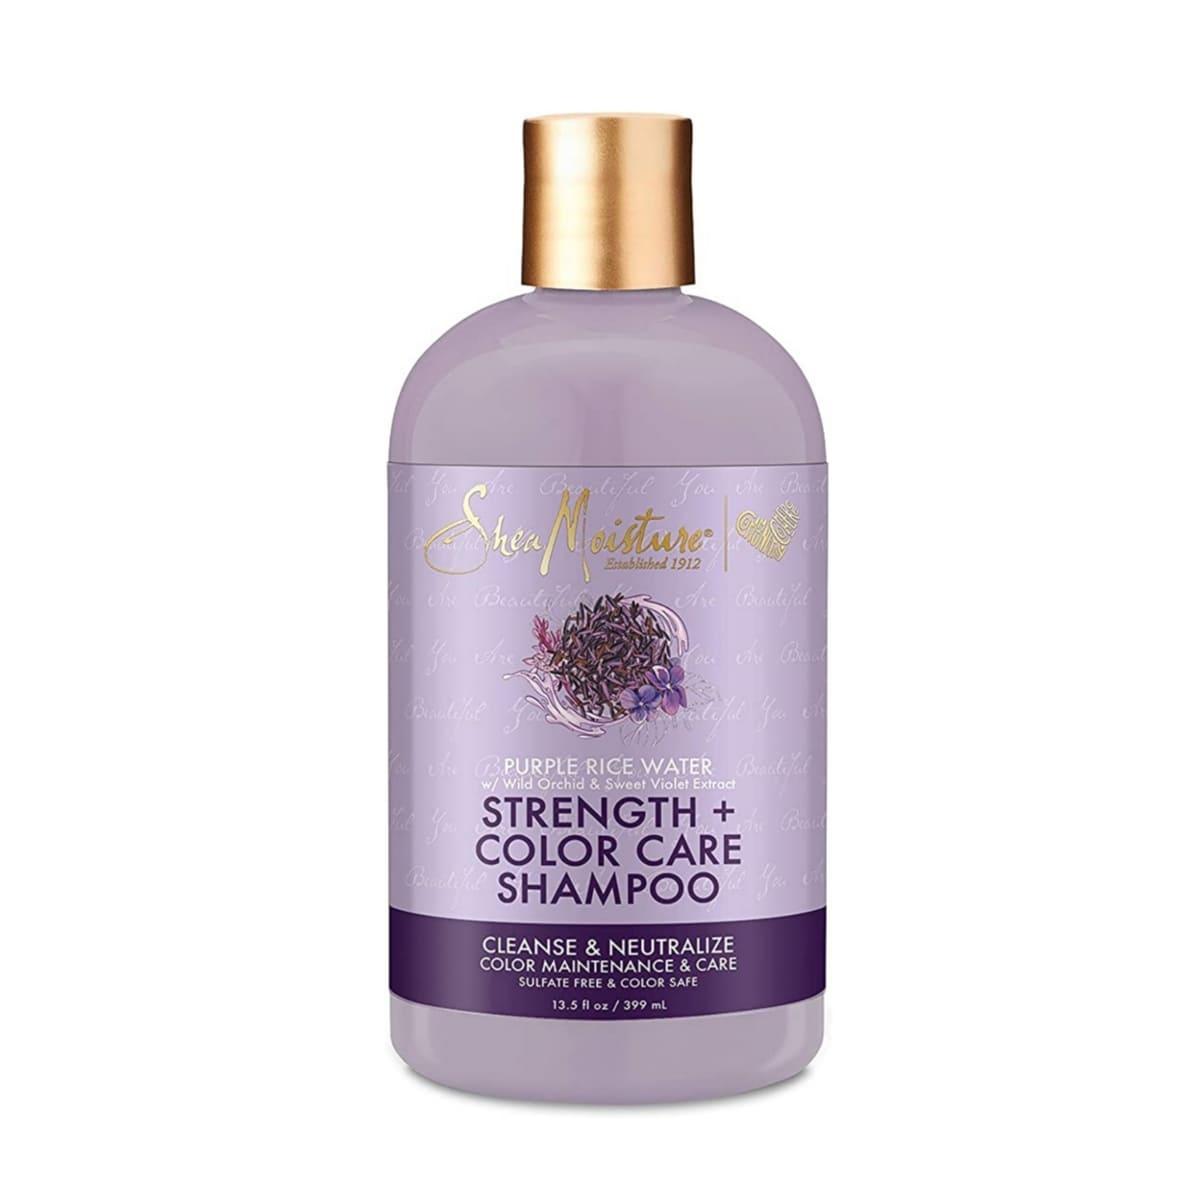 comprar-cosmetico-vegano-champu-strength-color-care-sheamoisture-metodo-curly-trenzas-crochet-pelucas-www.muerebella.com